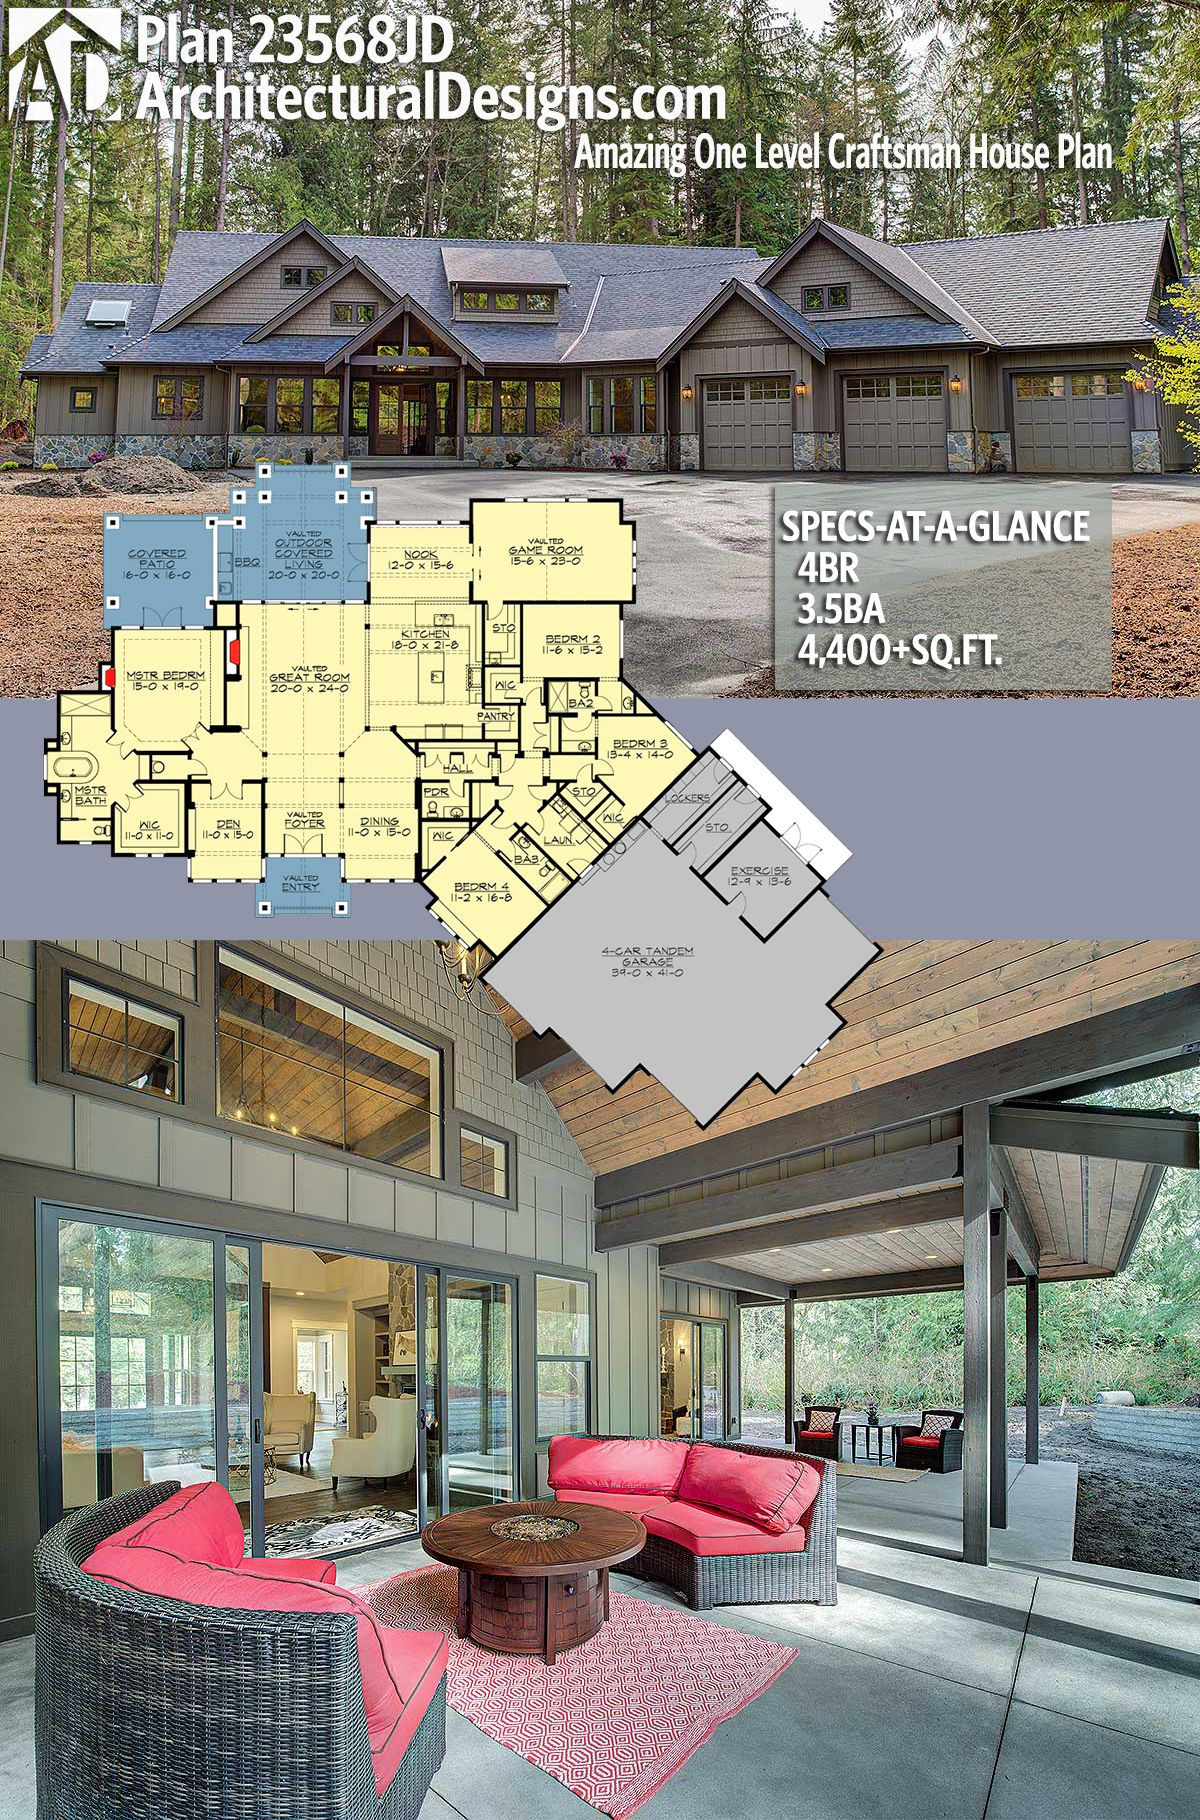 Plan 23568jd Amazing One Level Craftsman House Plan Architectural Design House Plans Craftsman House Craftsman House Plans